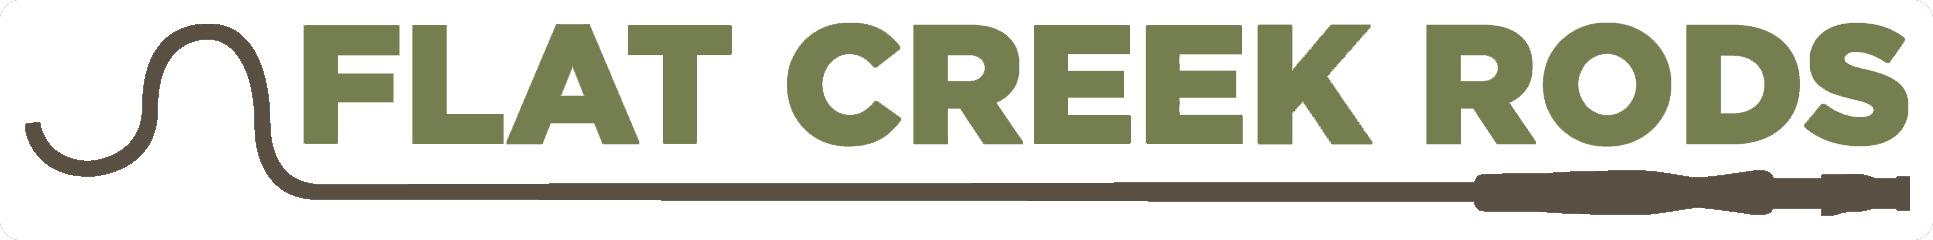 Flat Creek Rods